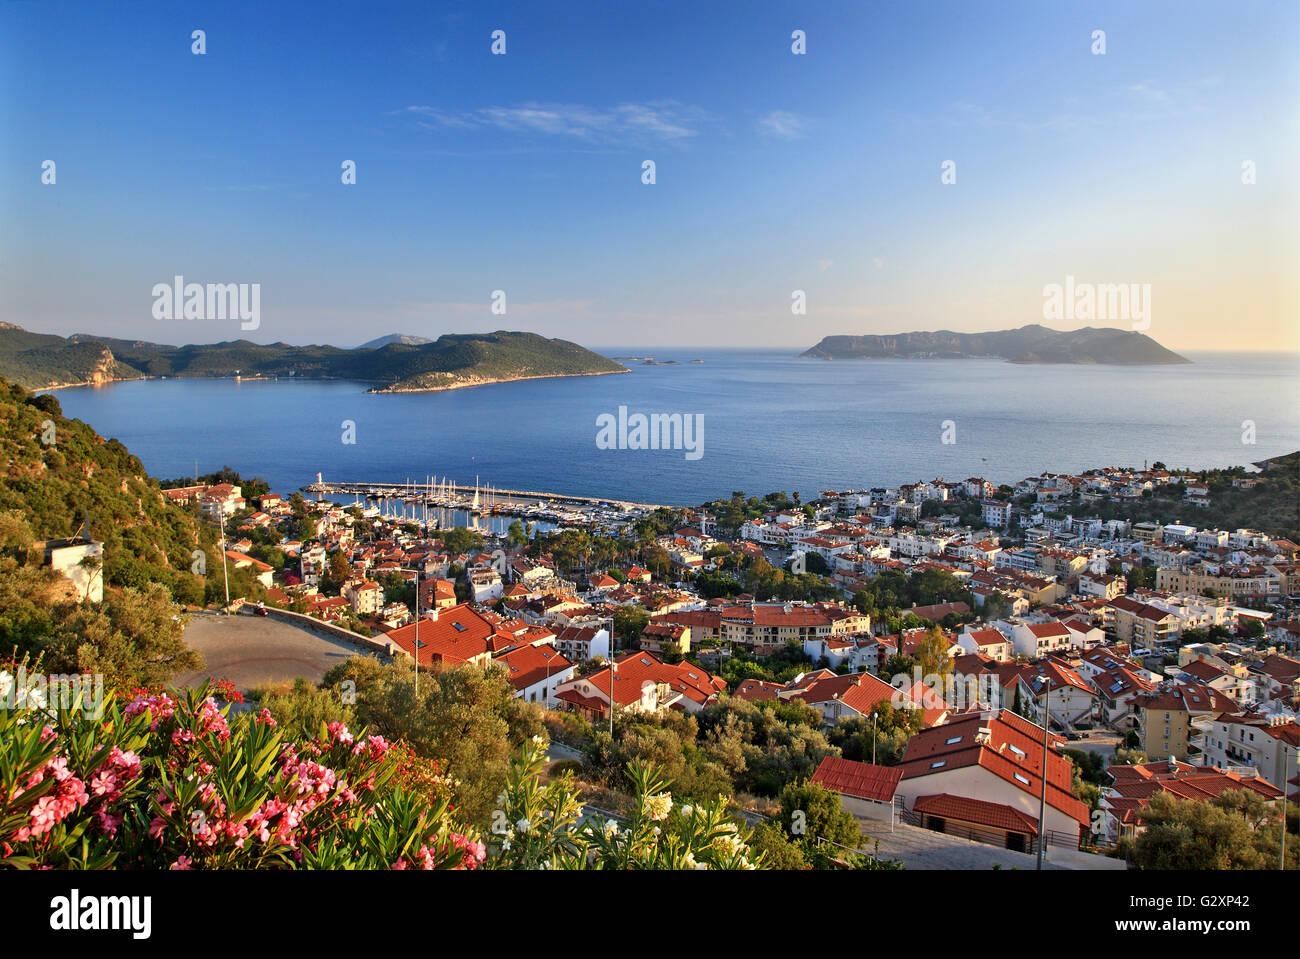 "La pittoresque ville de Kas (ancien nom ""Antiphellos'), la Lycie, province d'Antalya en Turquie. Dans Photo Stock"